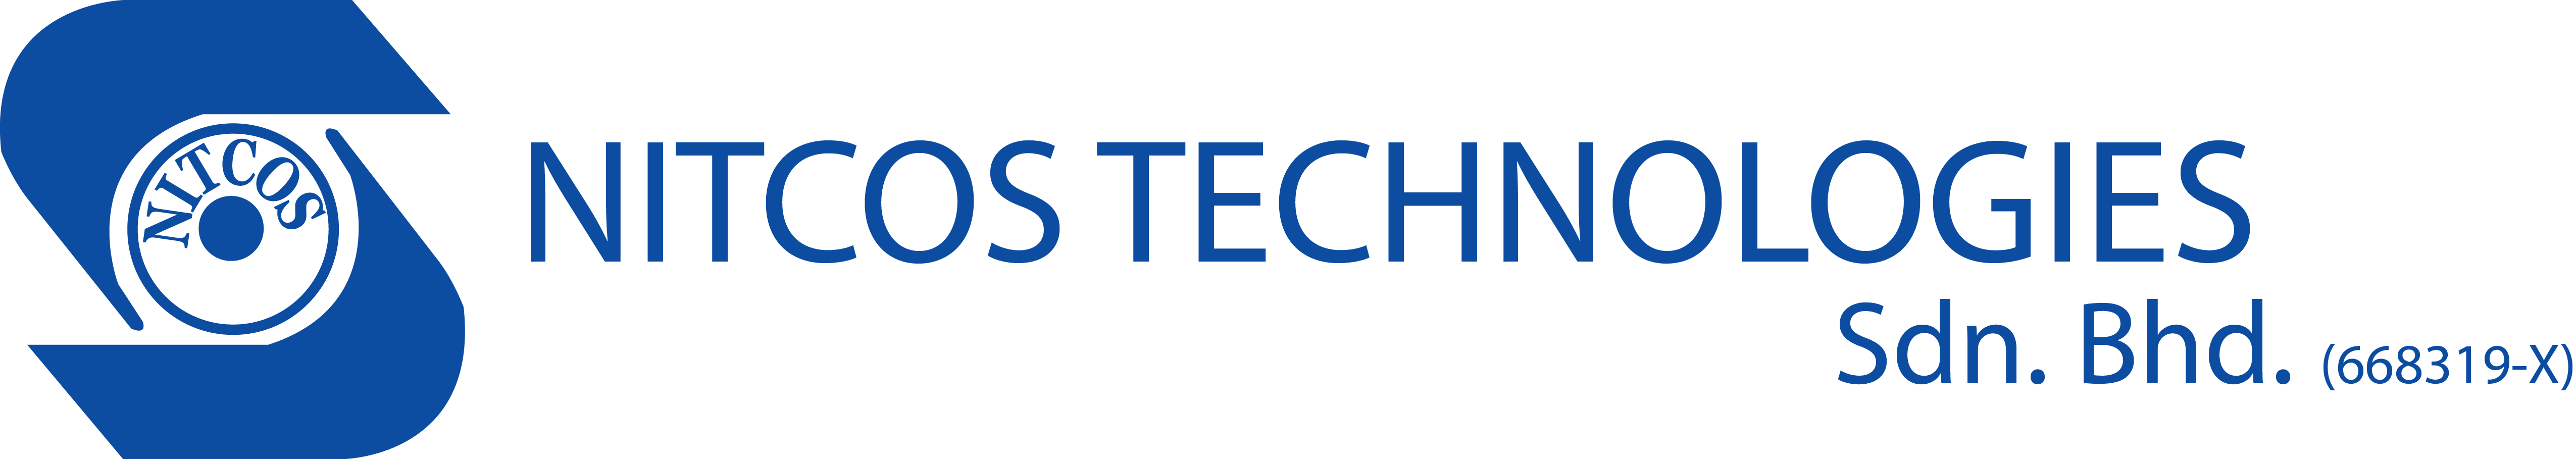 NITCOS TECHNOLOGIES SDN. BHD. (668319-X)